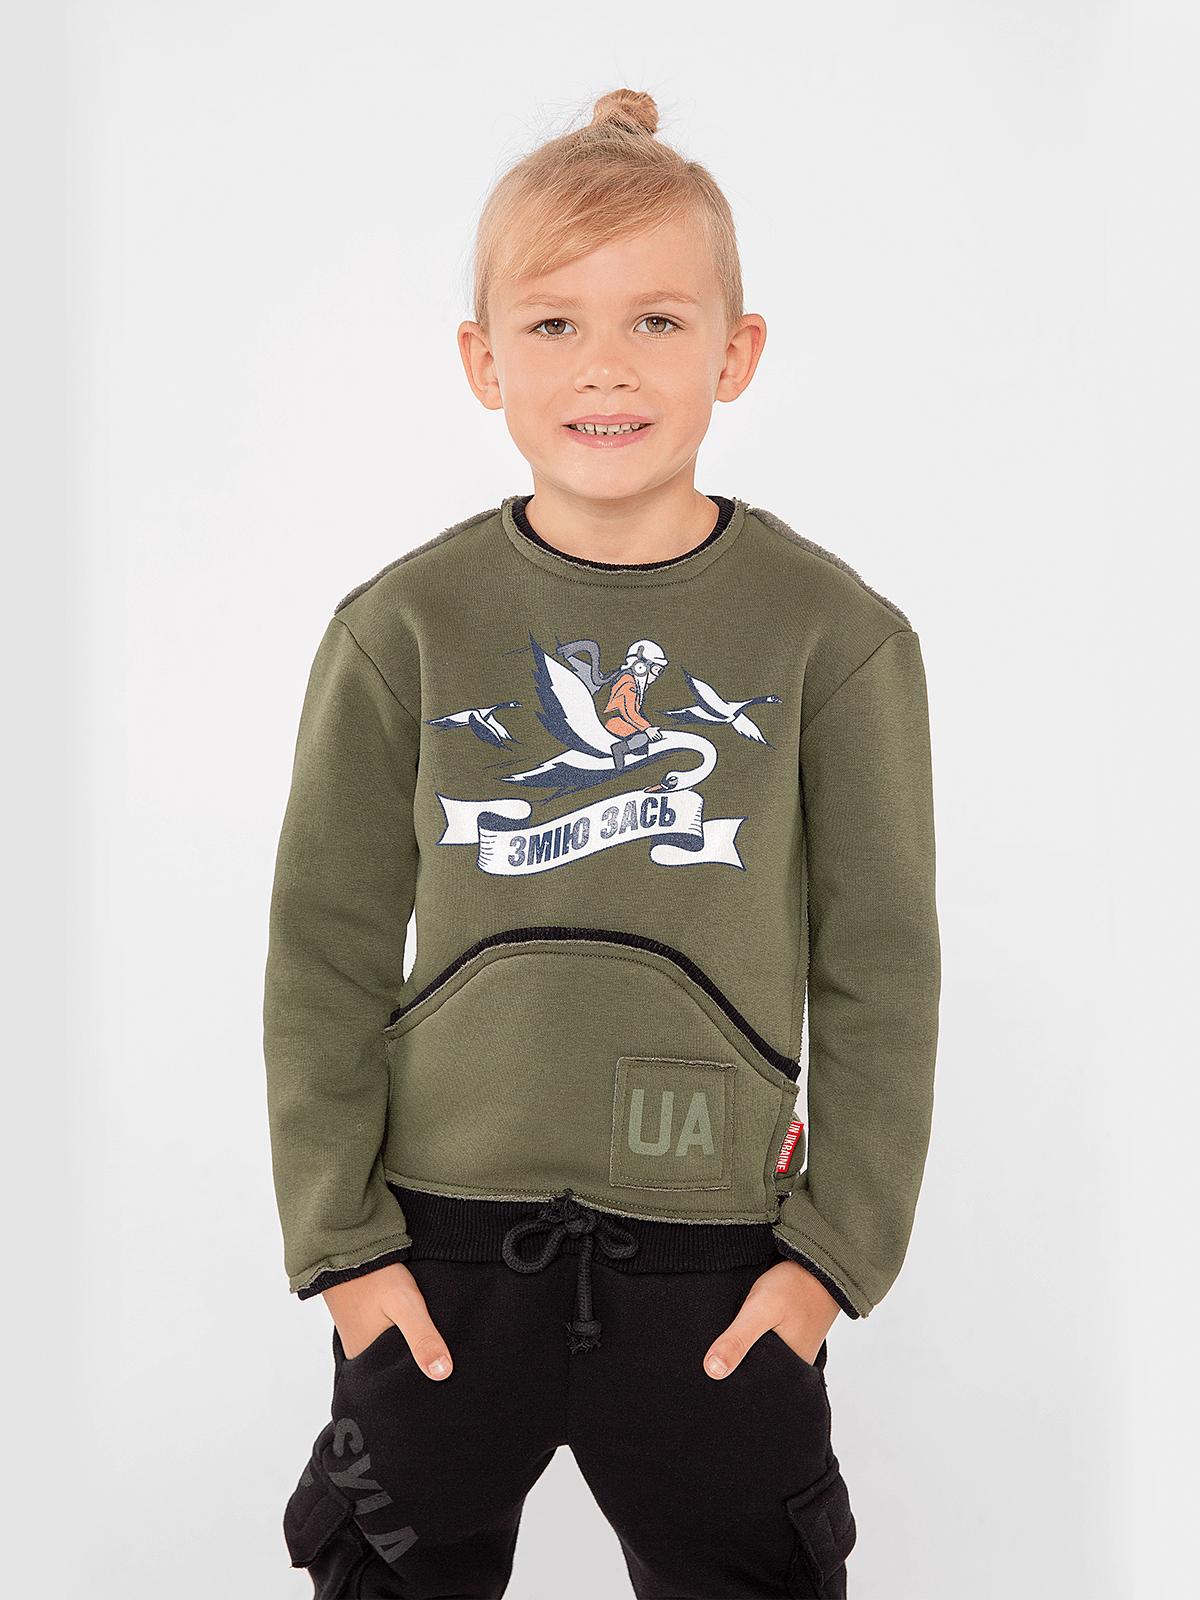 Kids Sweatshirt Dragon Won't Get It!. Color khaki. Sweatshirt: unisex, well suited for both boys and girls.